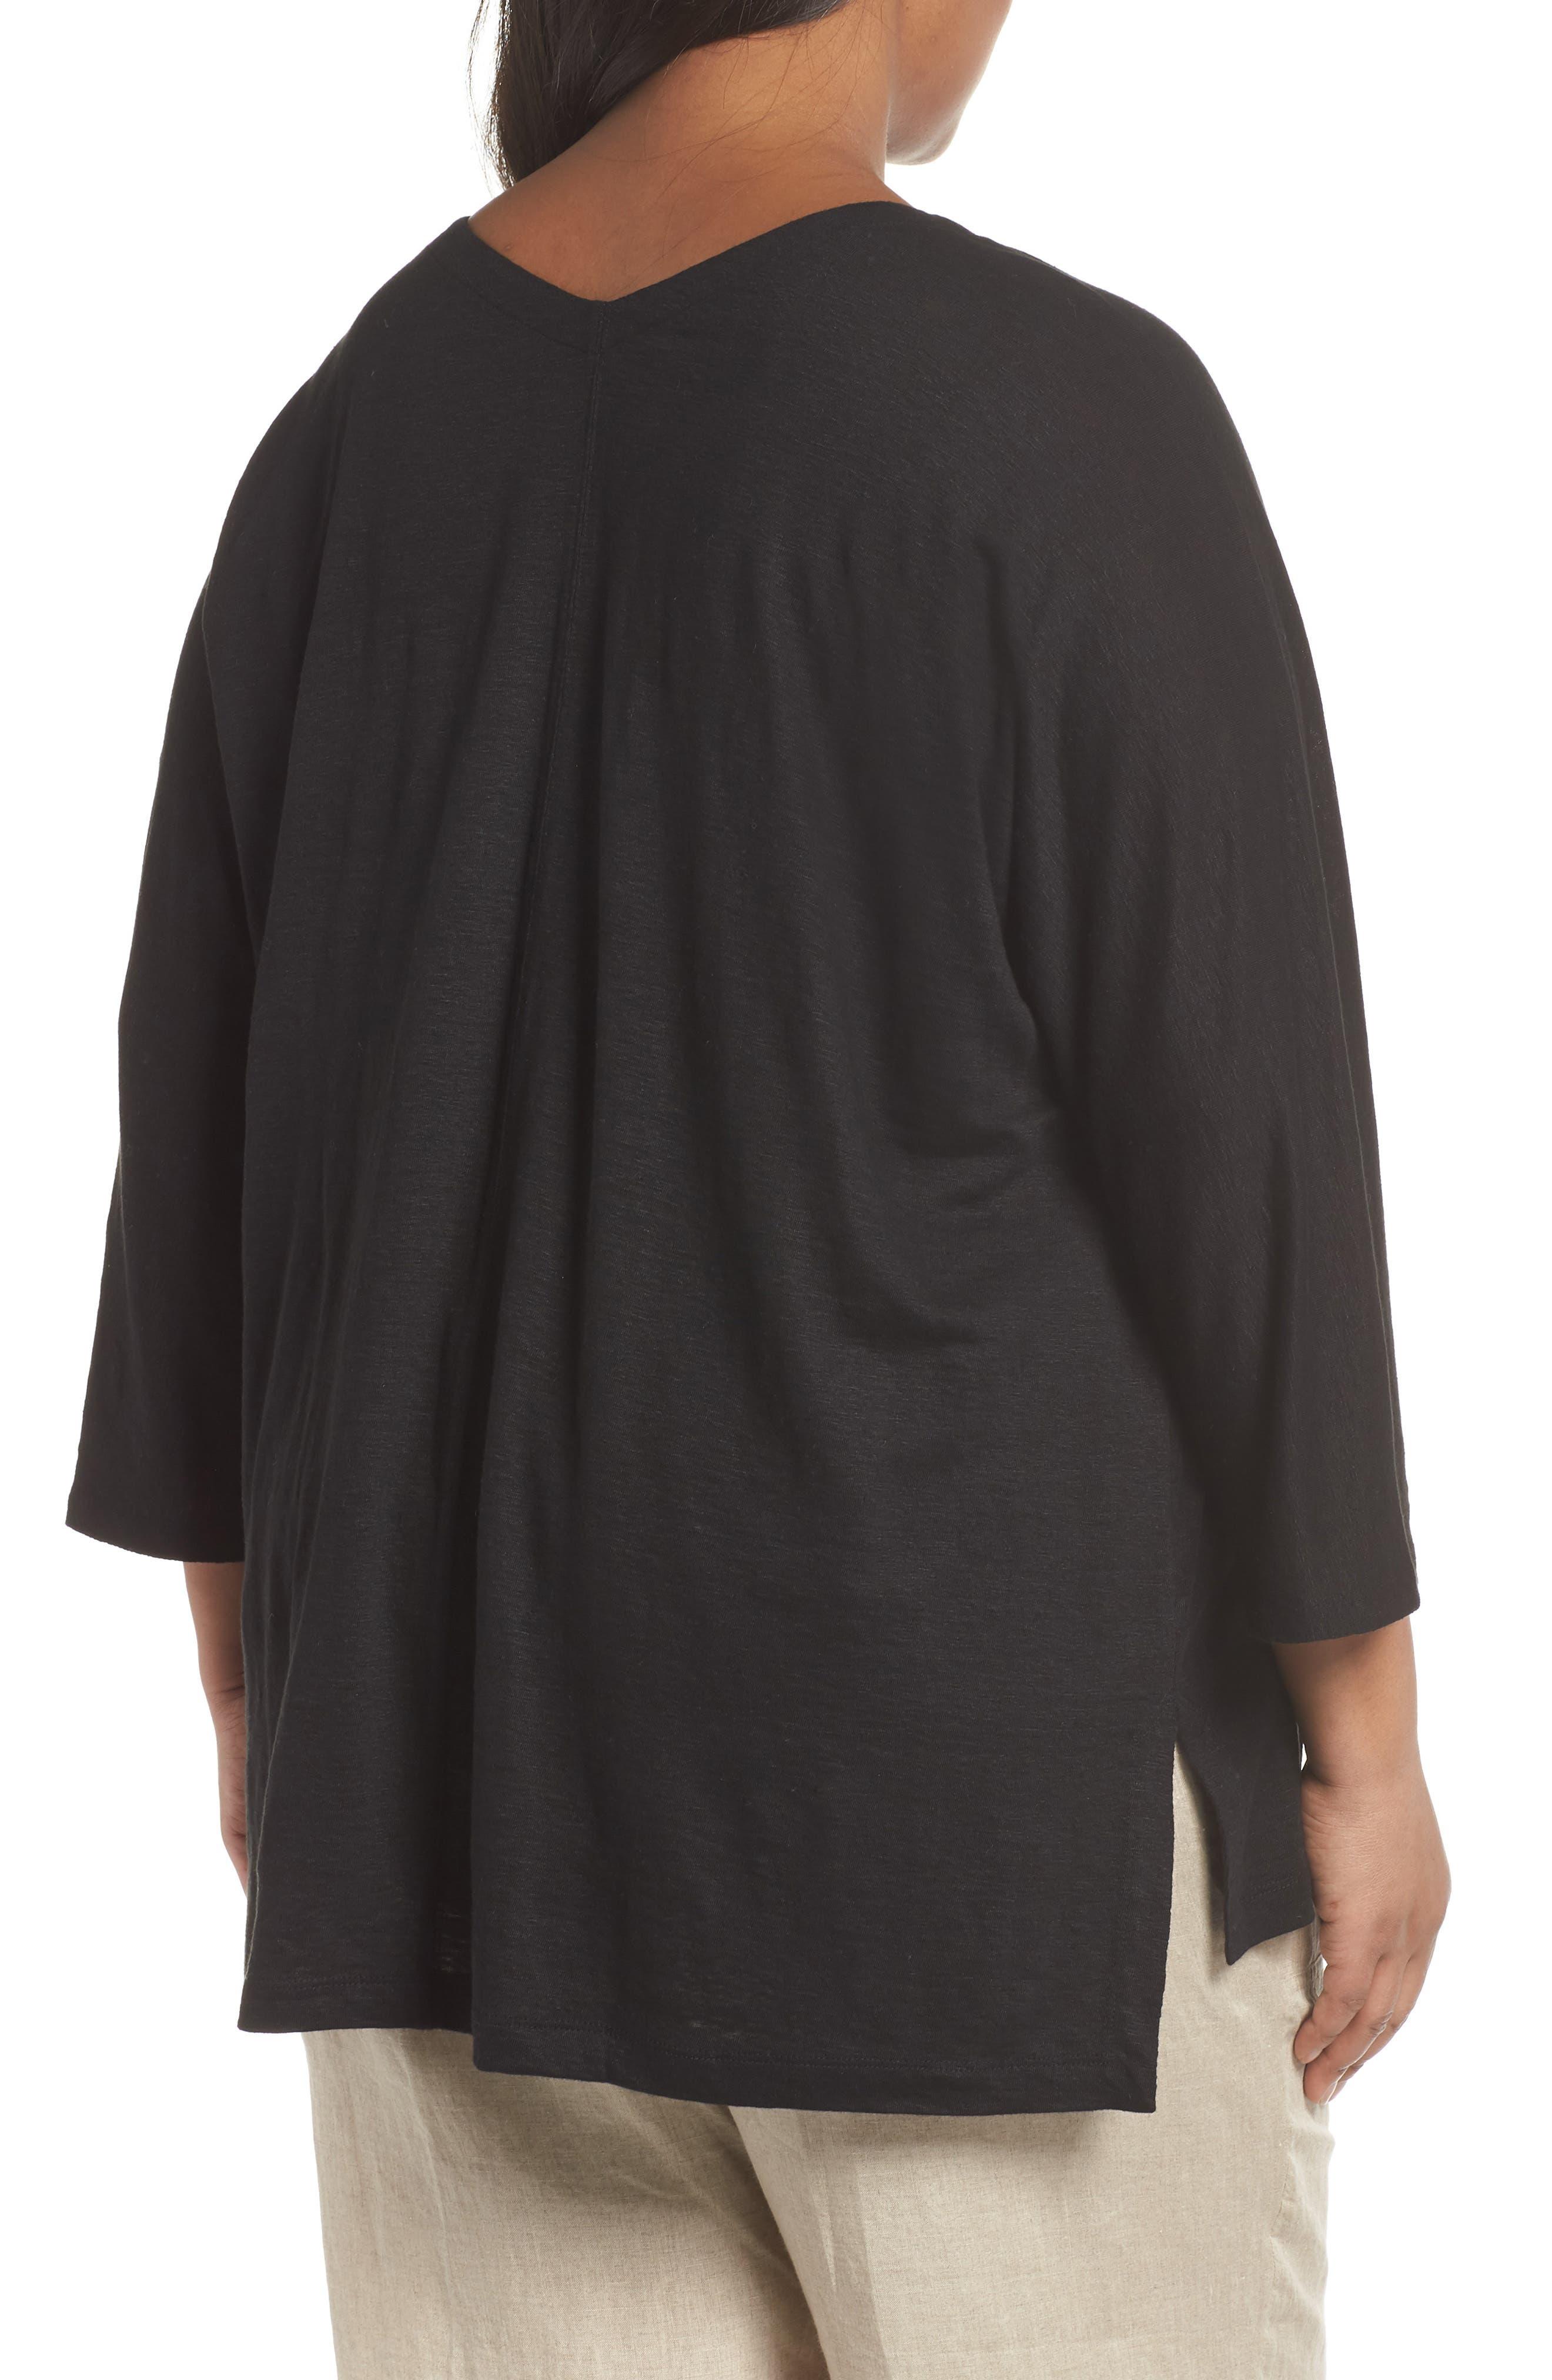 Alternate Image 2  - Eileen Fisher Organic Linen Top (Plus Size)